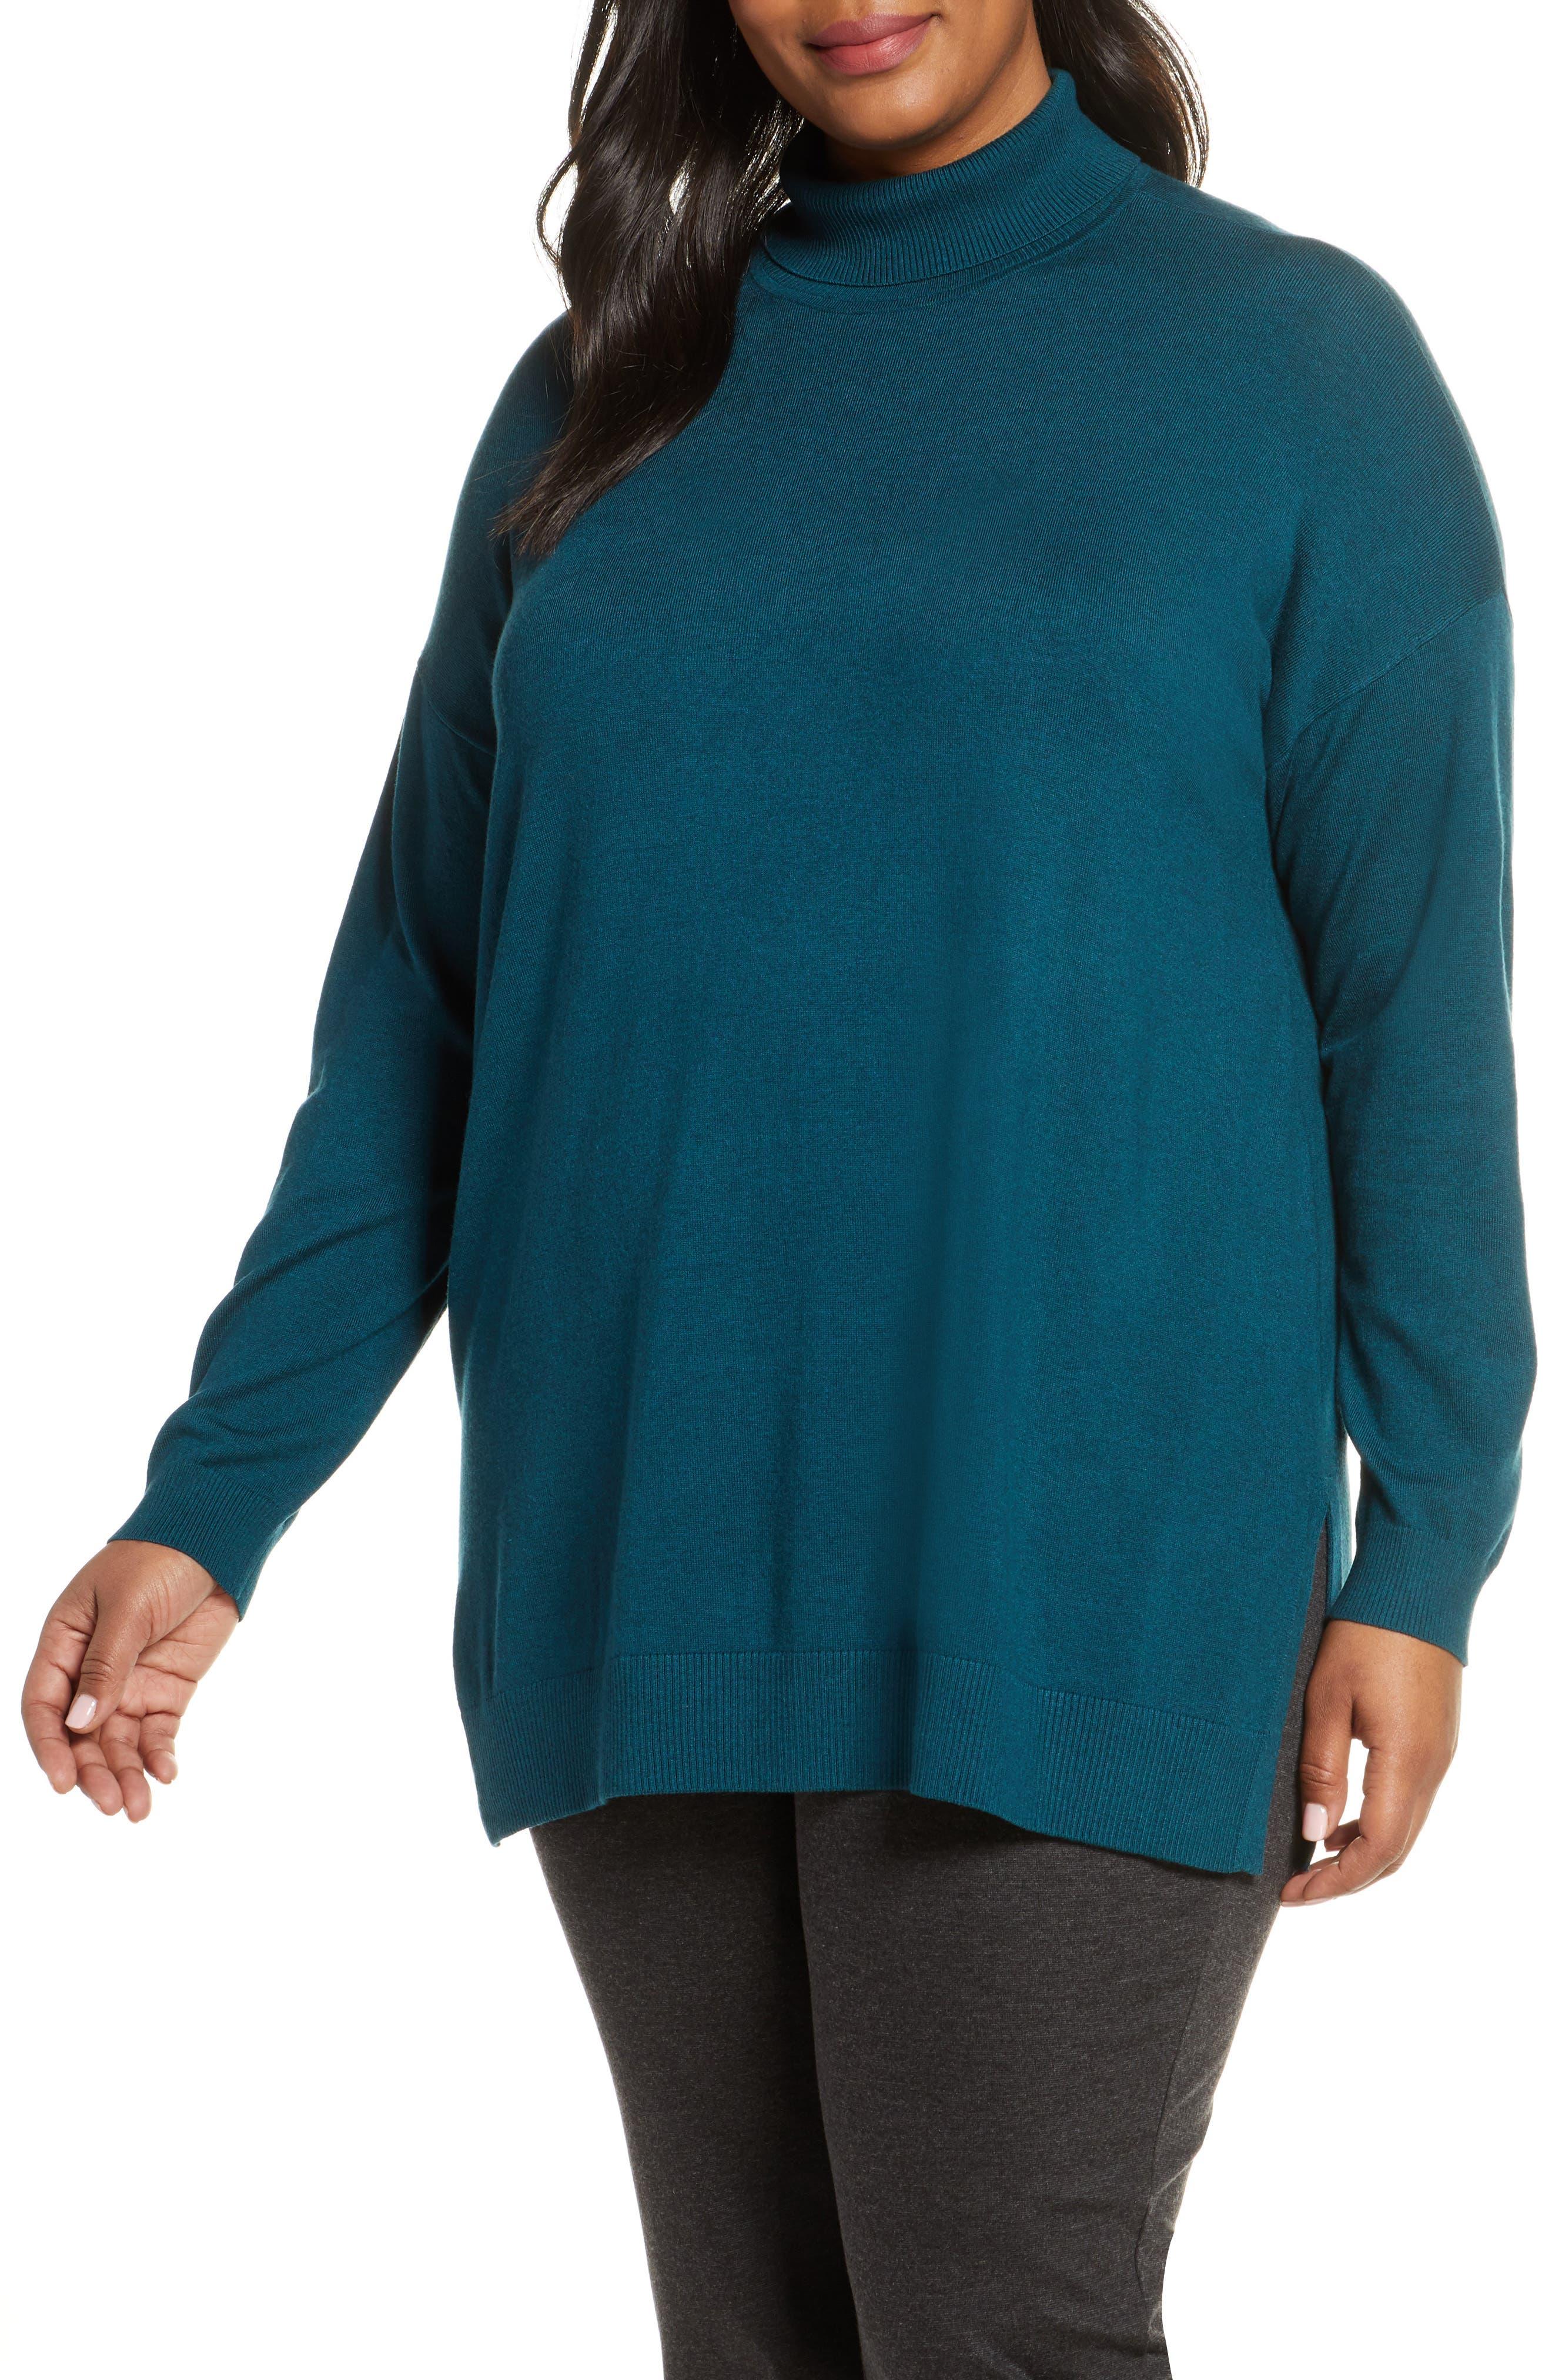 Eileen Fisher Turtleneck Tunic Sweater (Plus Size)